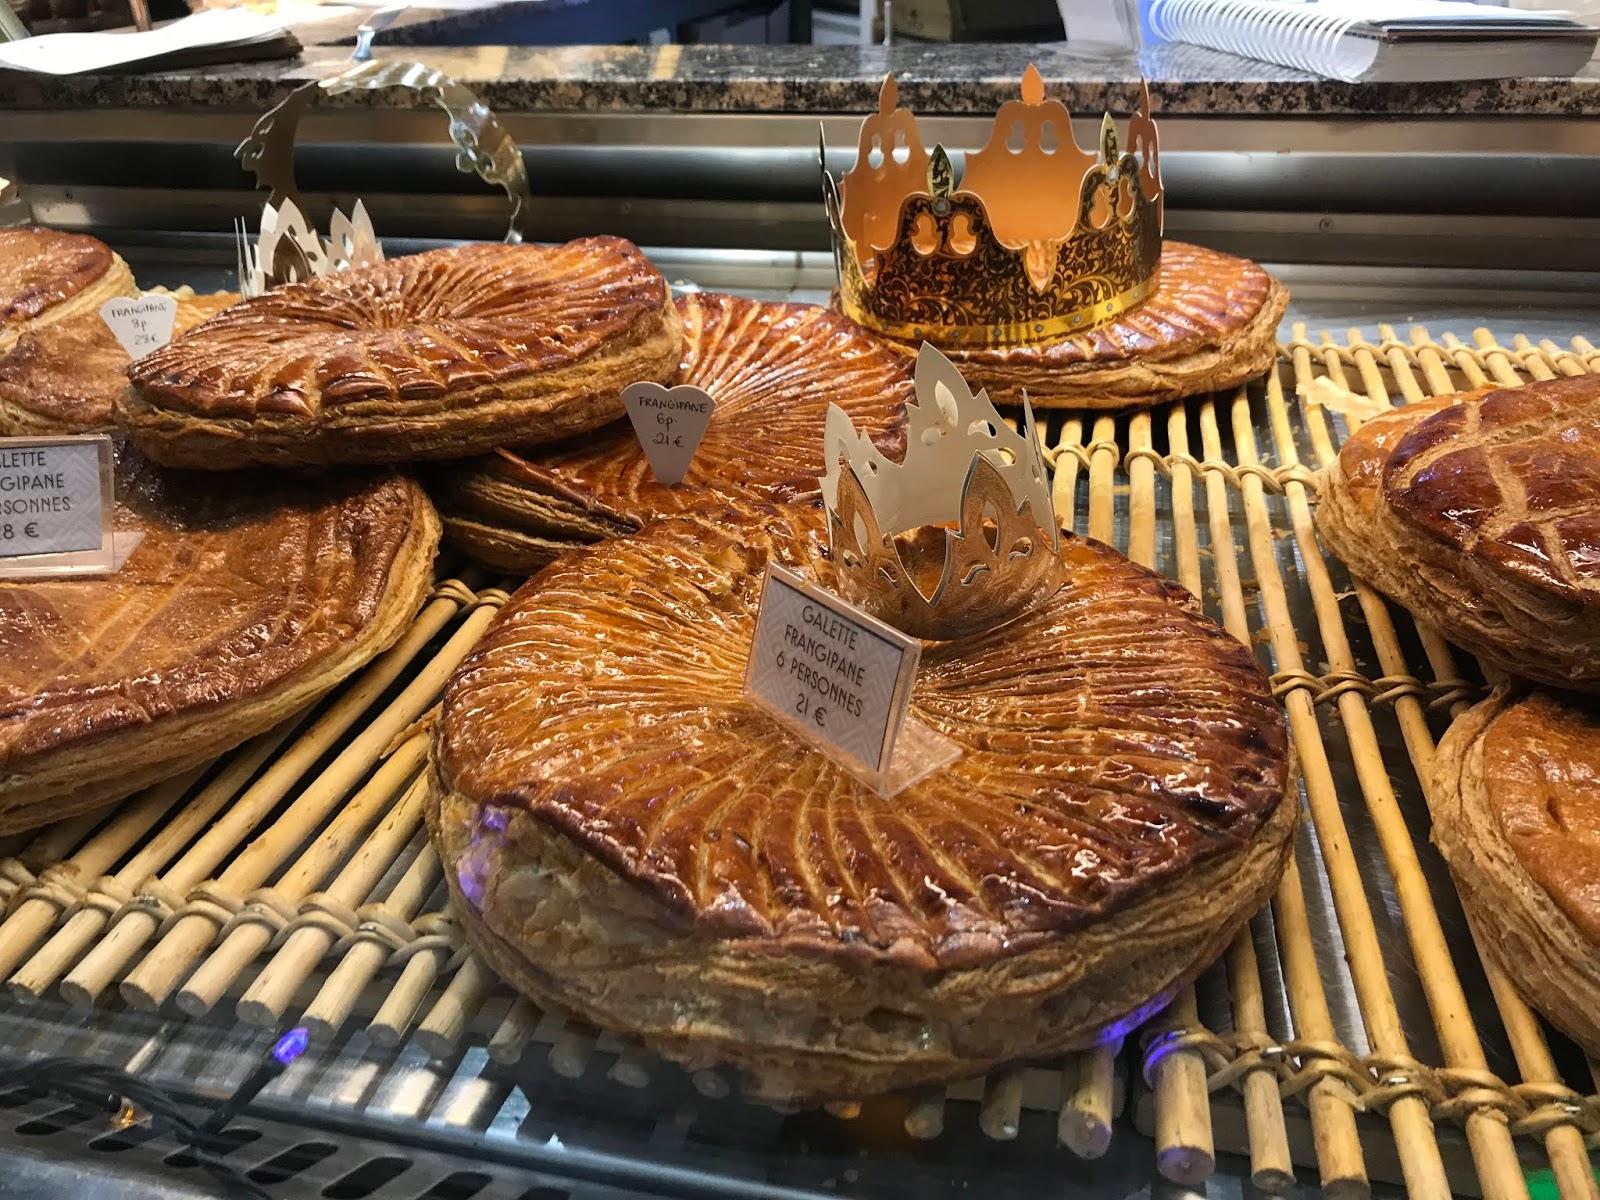 galette des rois leipomon ikkunassa